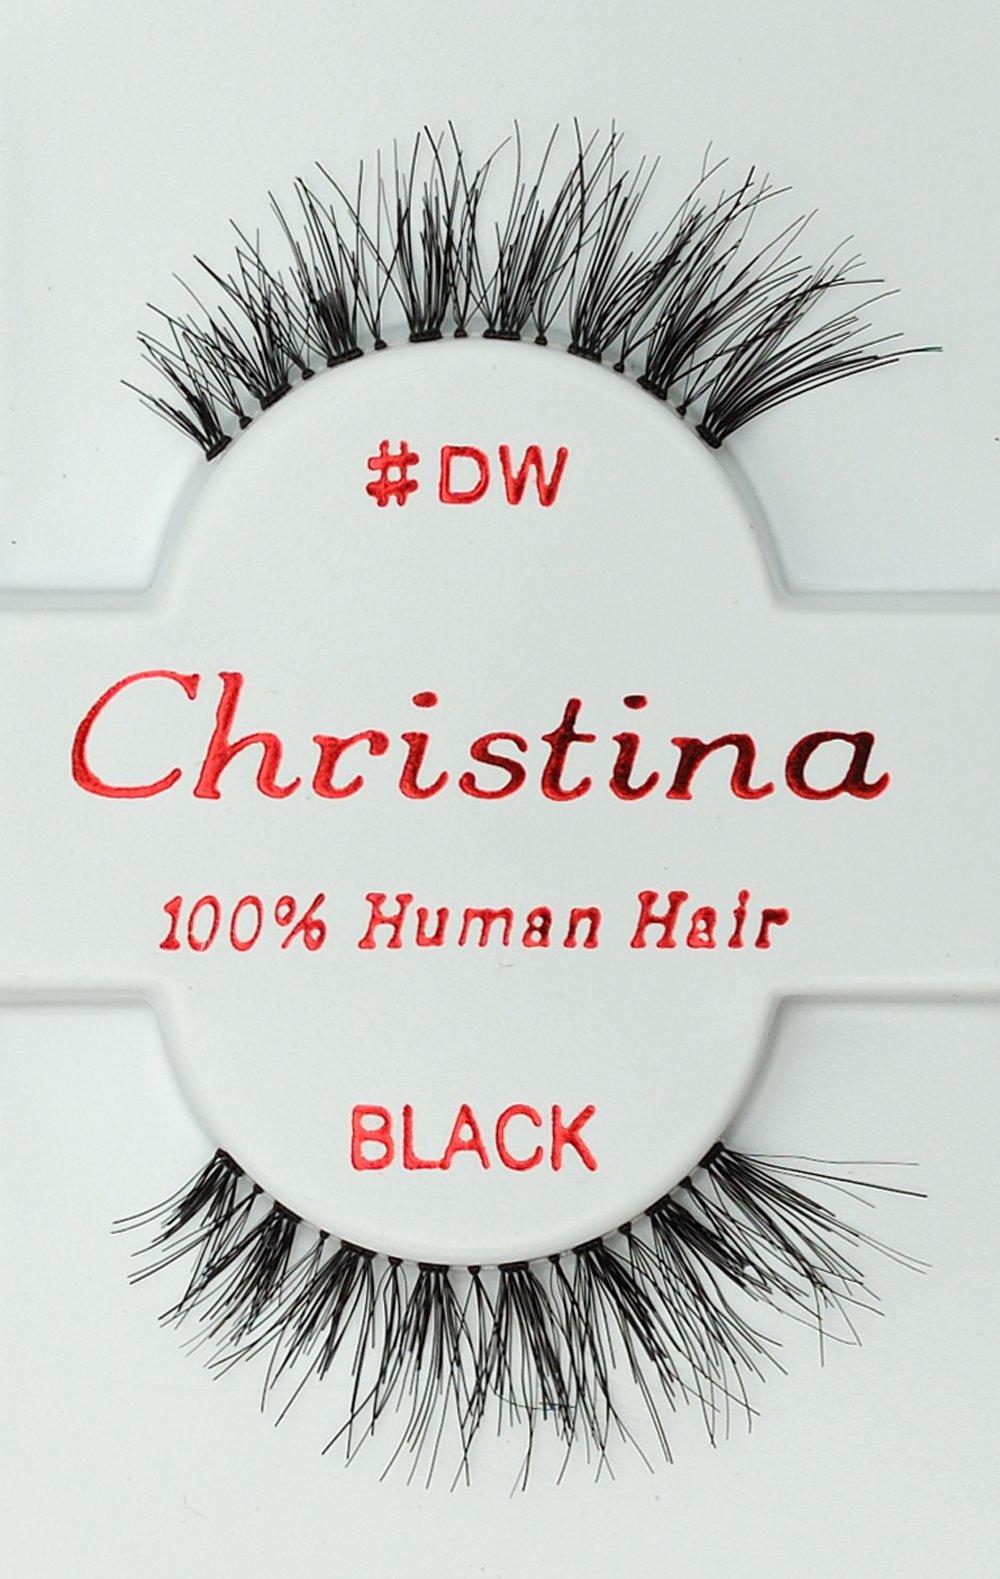 Christina Eyelashes 60packs #DW by Christian Brand